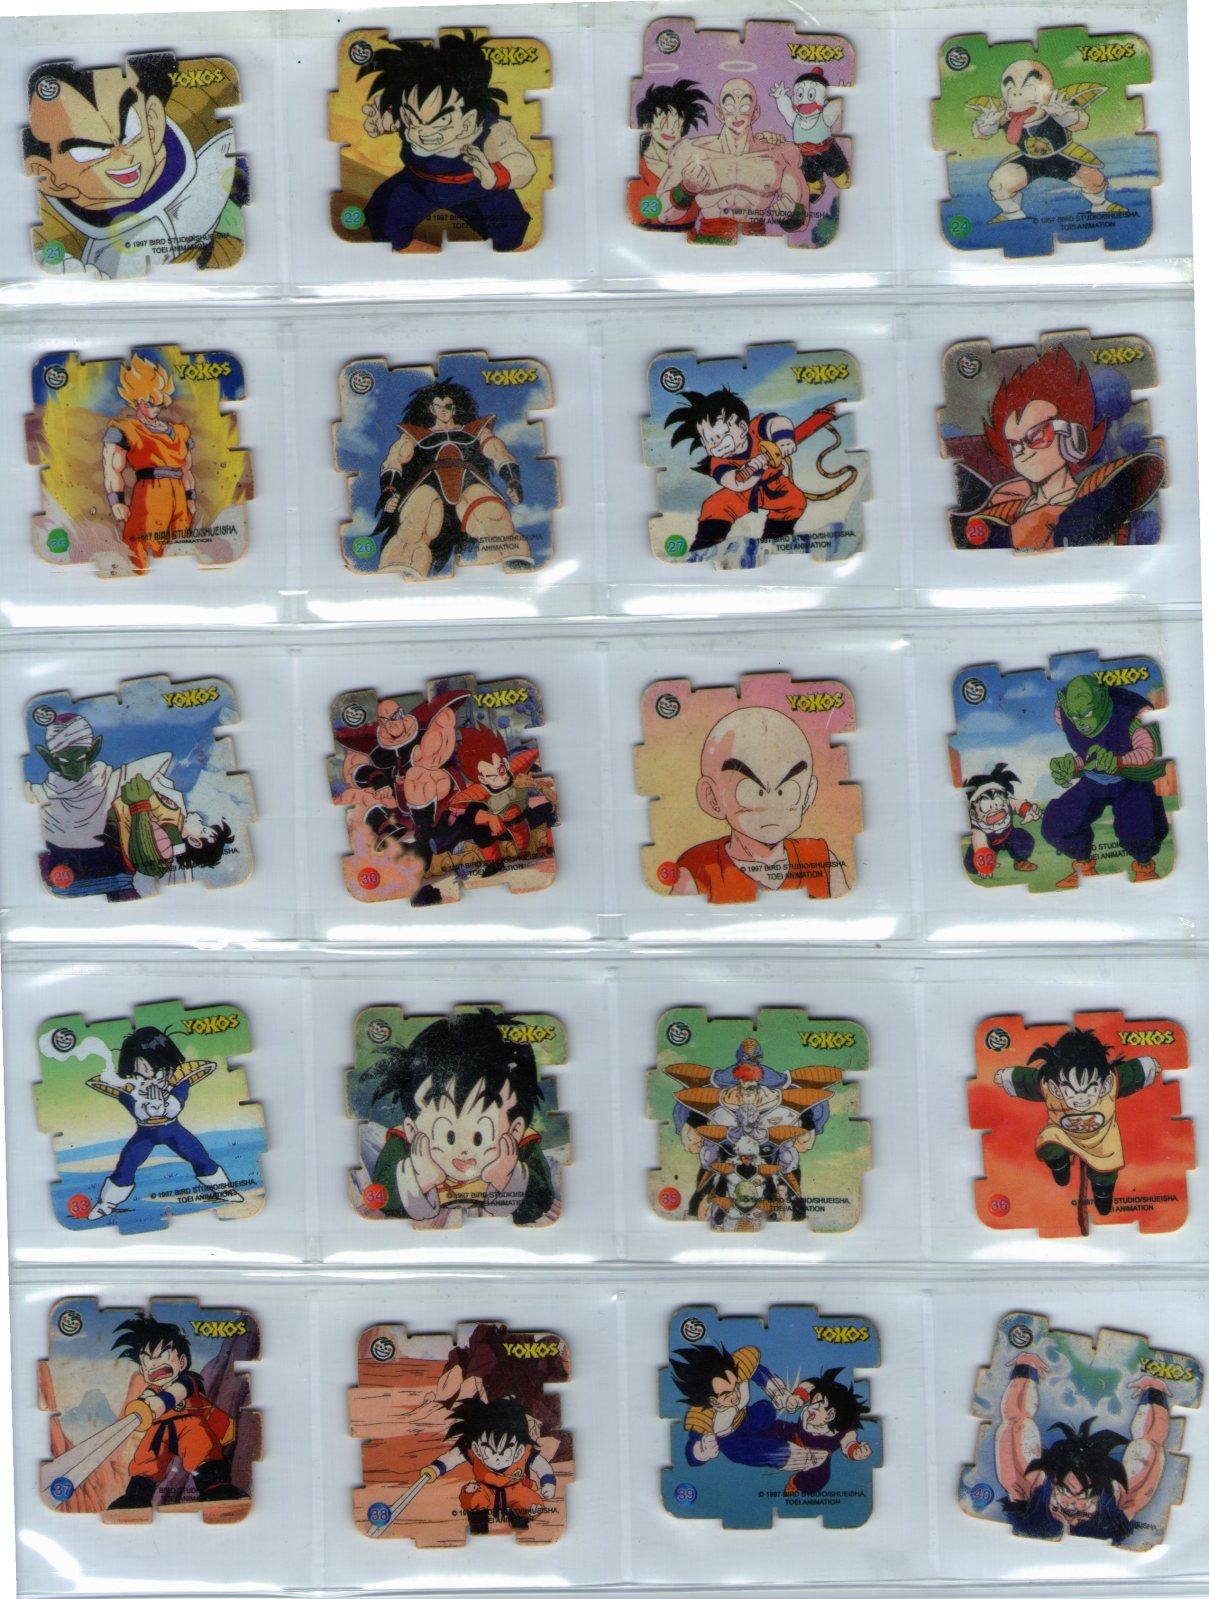 Yokos Dragon Ball Z de SABRITAS 2yvuozm